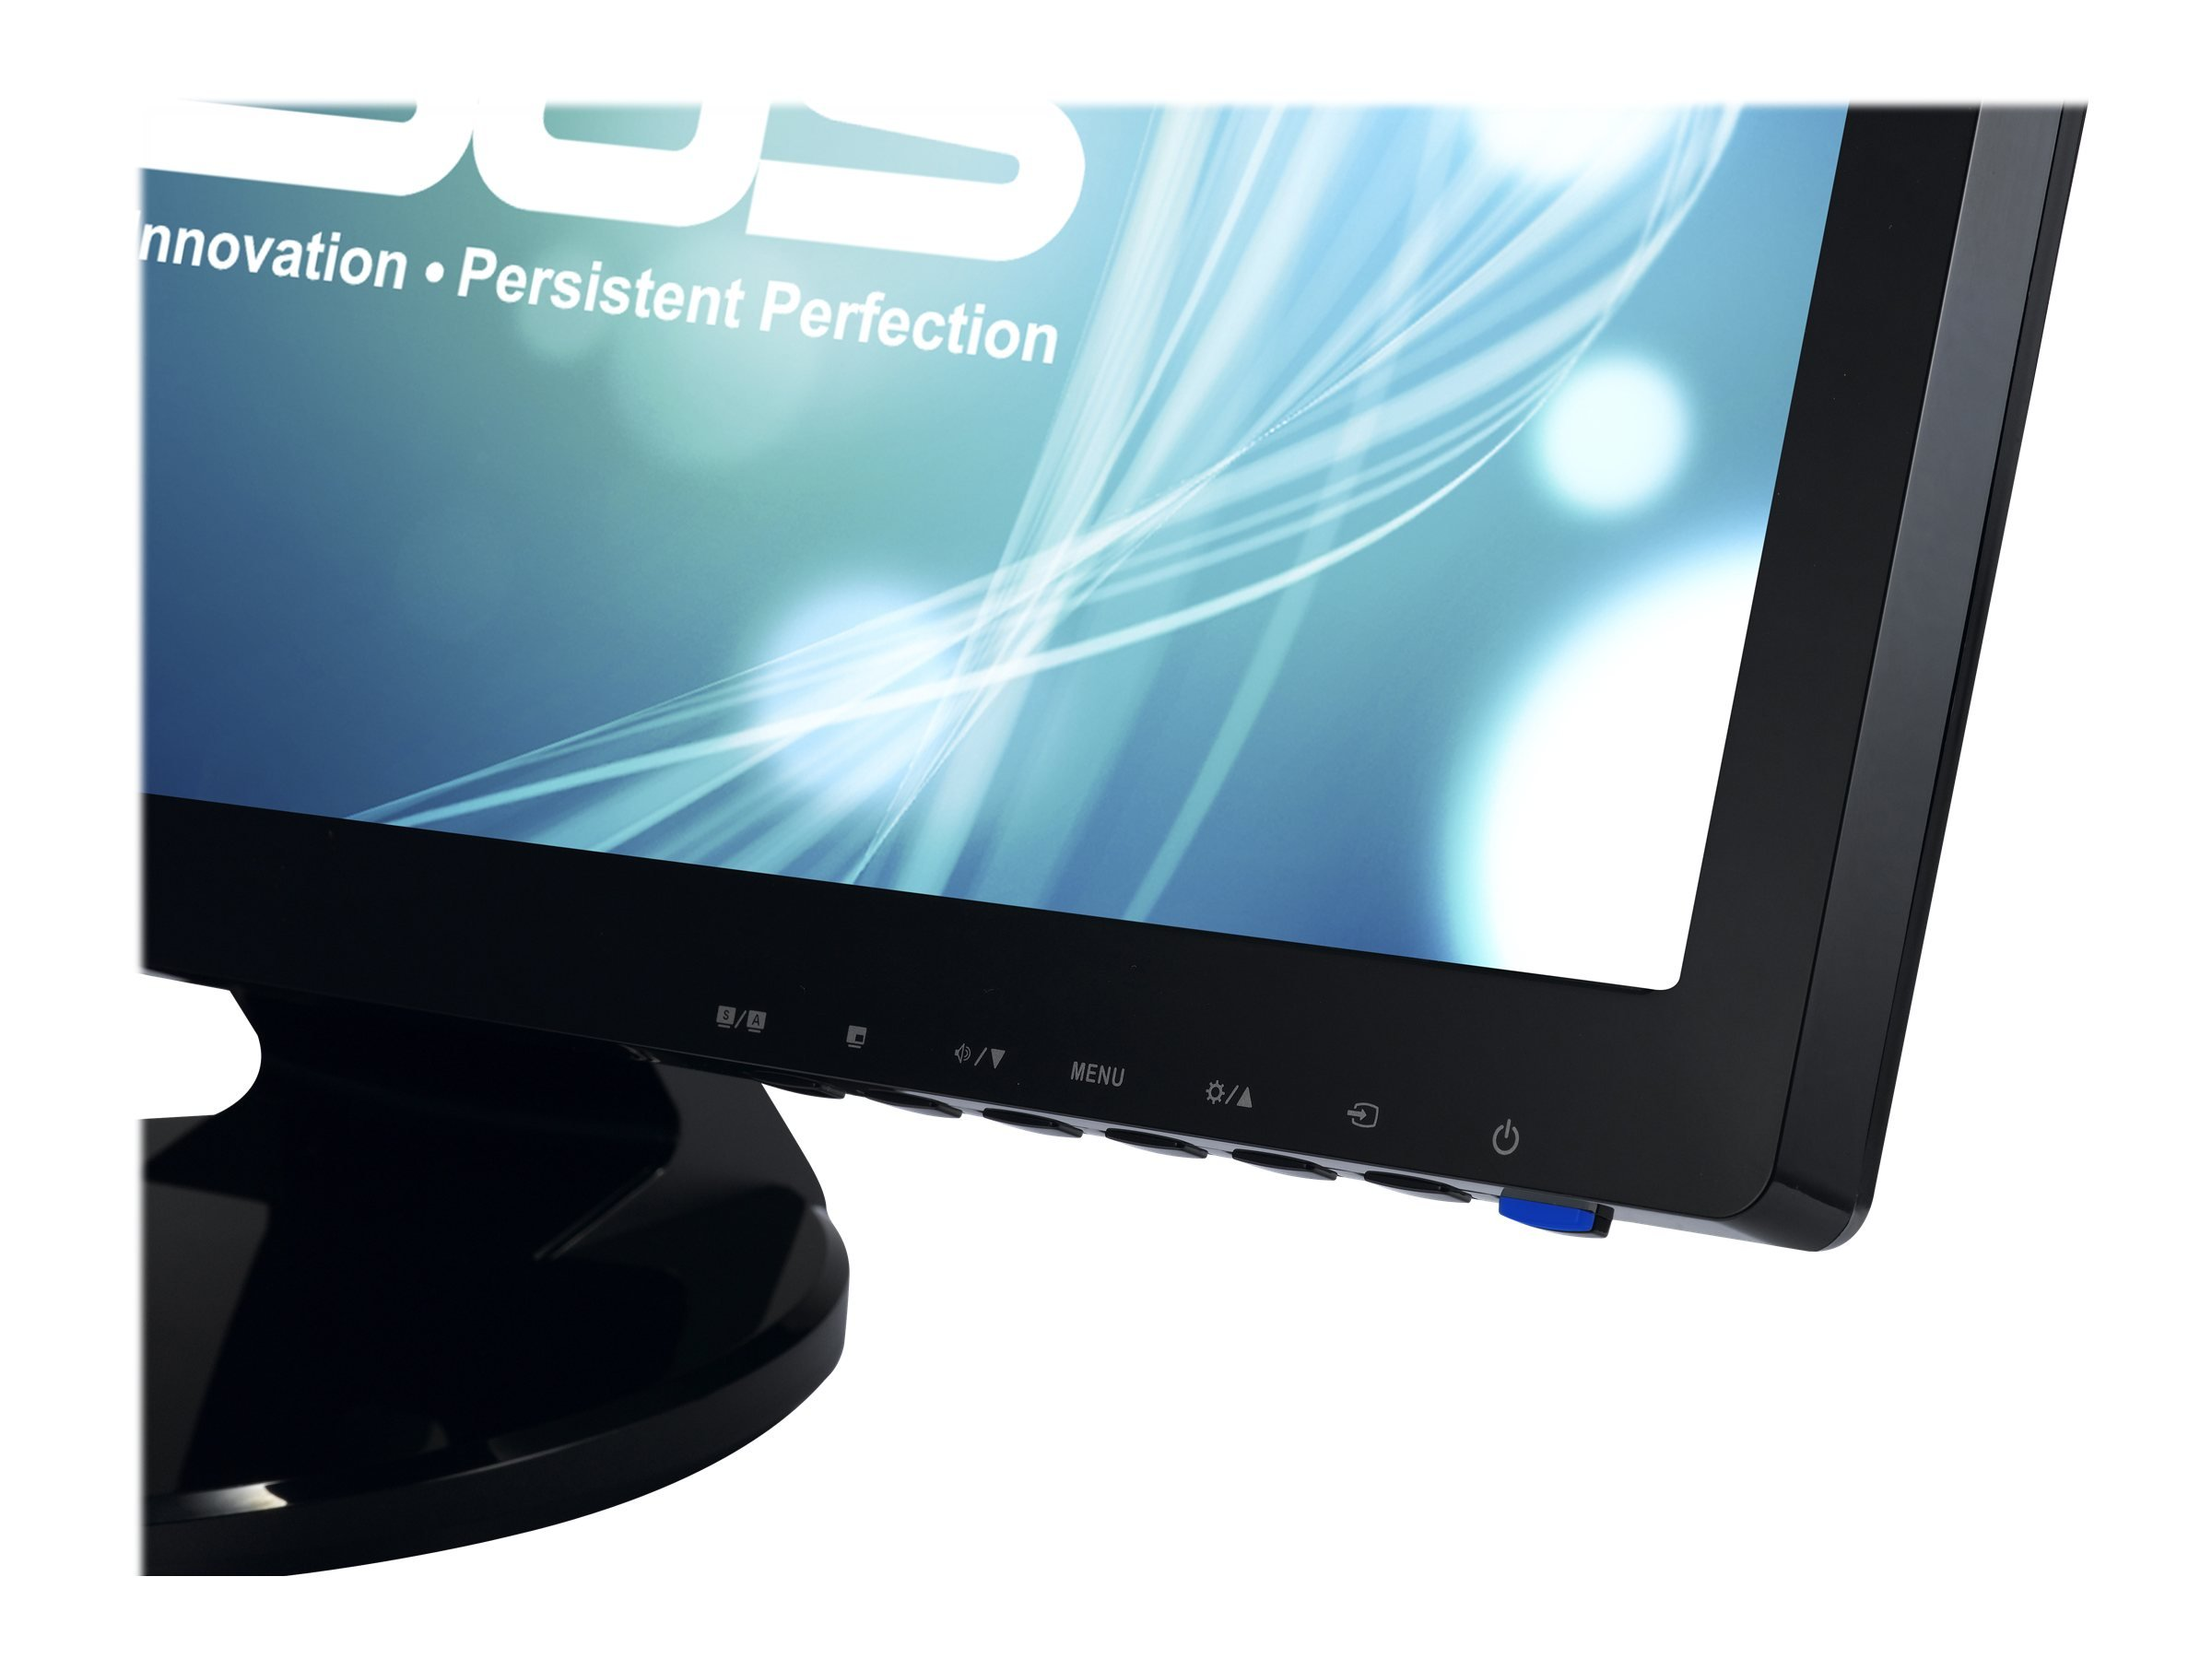 ASUS VE278Q 27'' Full HD 1920x1080 2ms DisplayPort HDMI DVI VGA Monitor